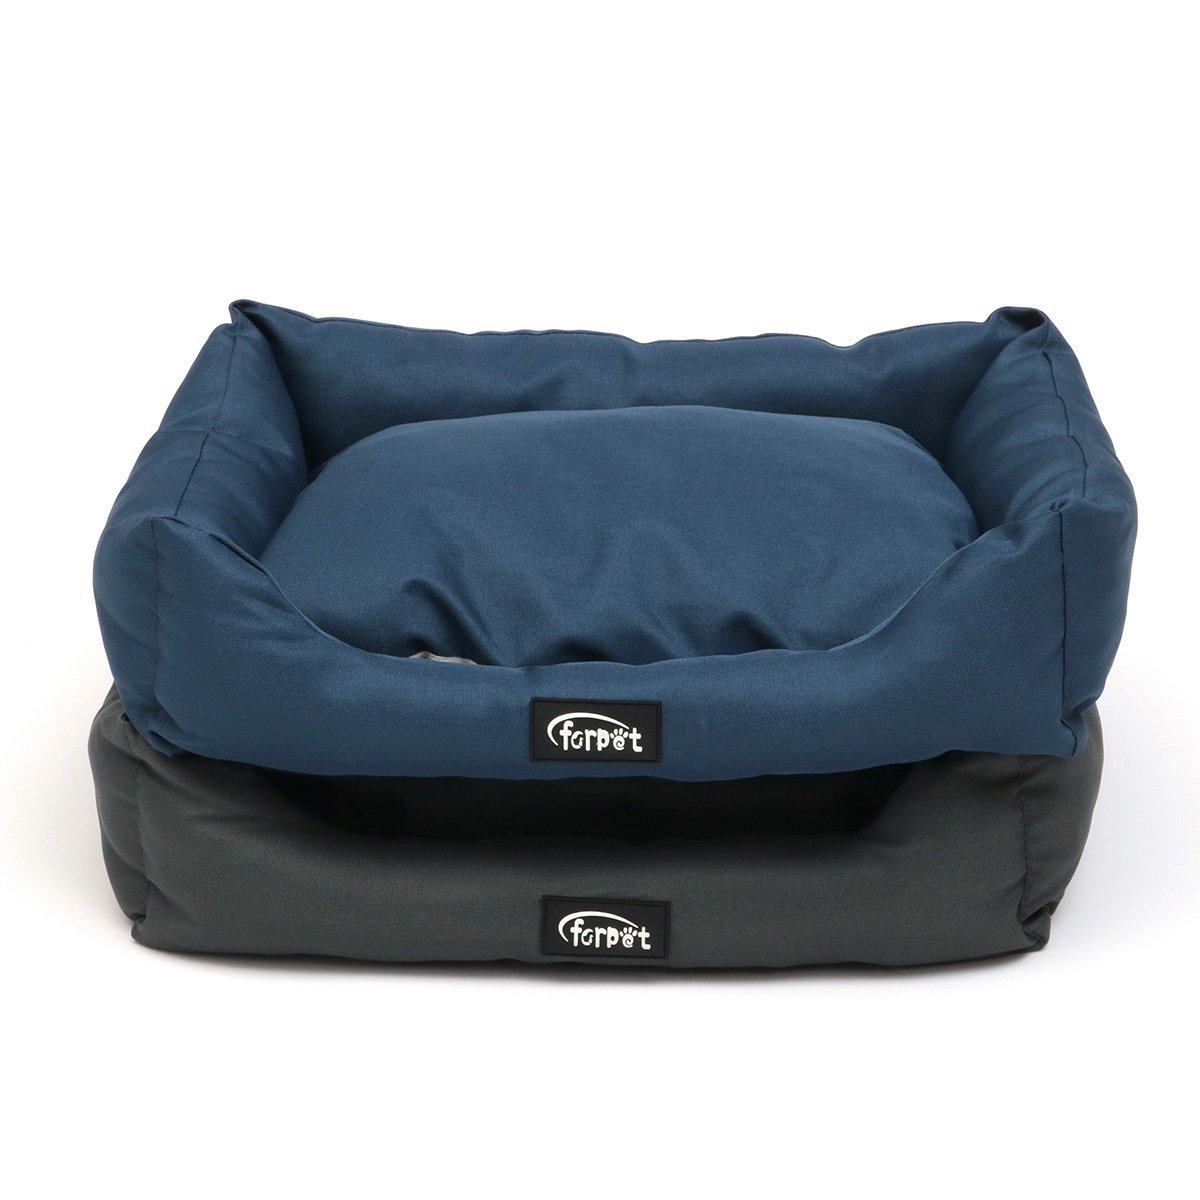 Royal Isali 19'' Dog Bed Waterproof Washable Hardwearing Pet Basket Mat Cushion Pet Bag (color  Royal) Cat Kennels,Beds & Houses